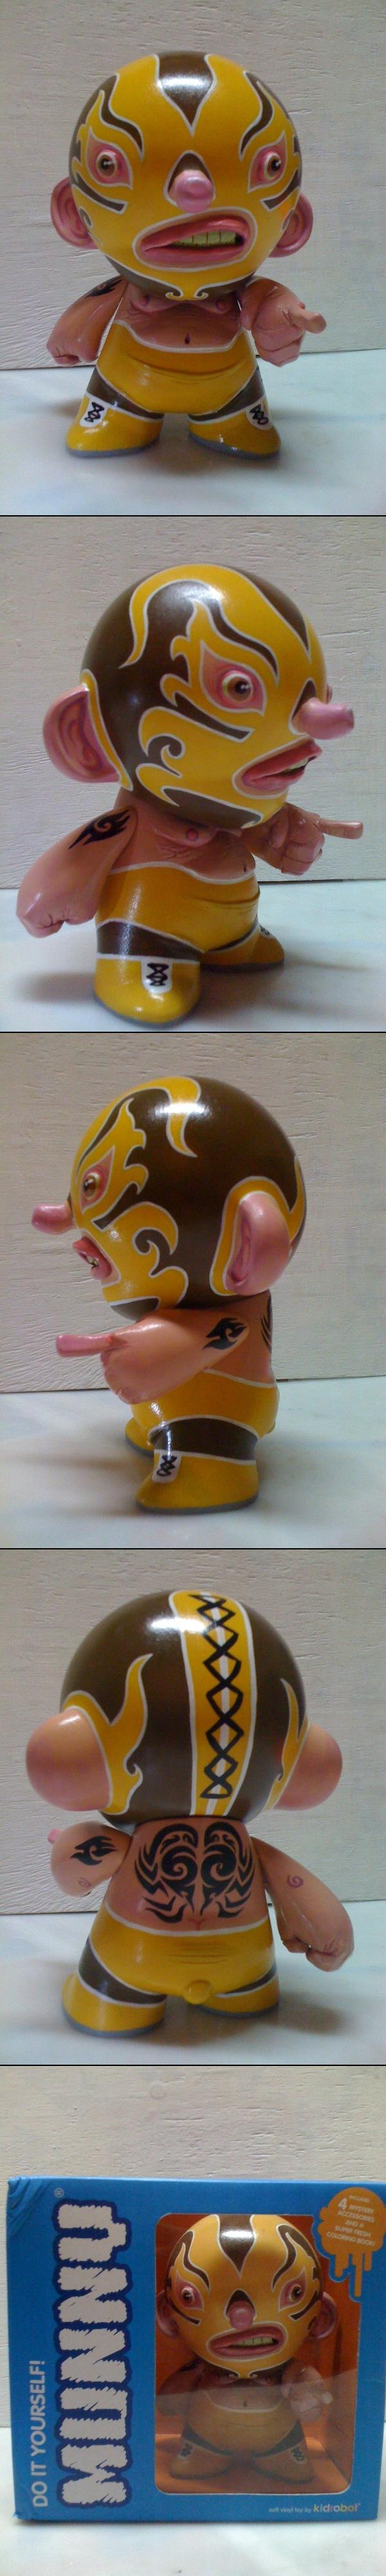 http://www.toydesignserved.com/gallery/La-Cucaracha/551801